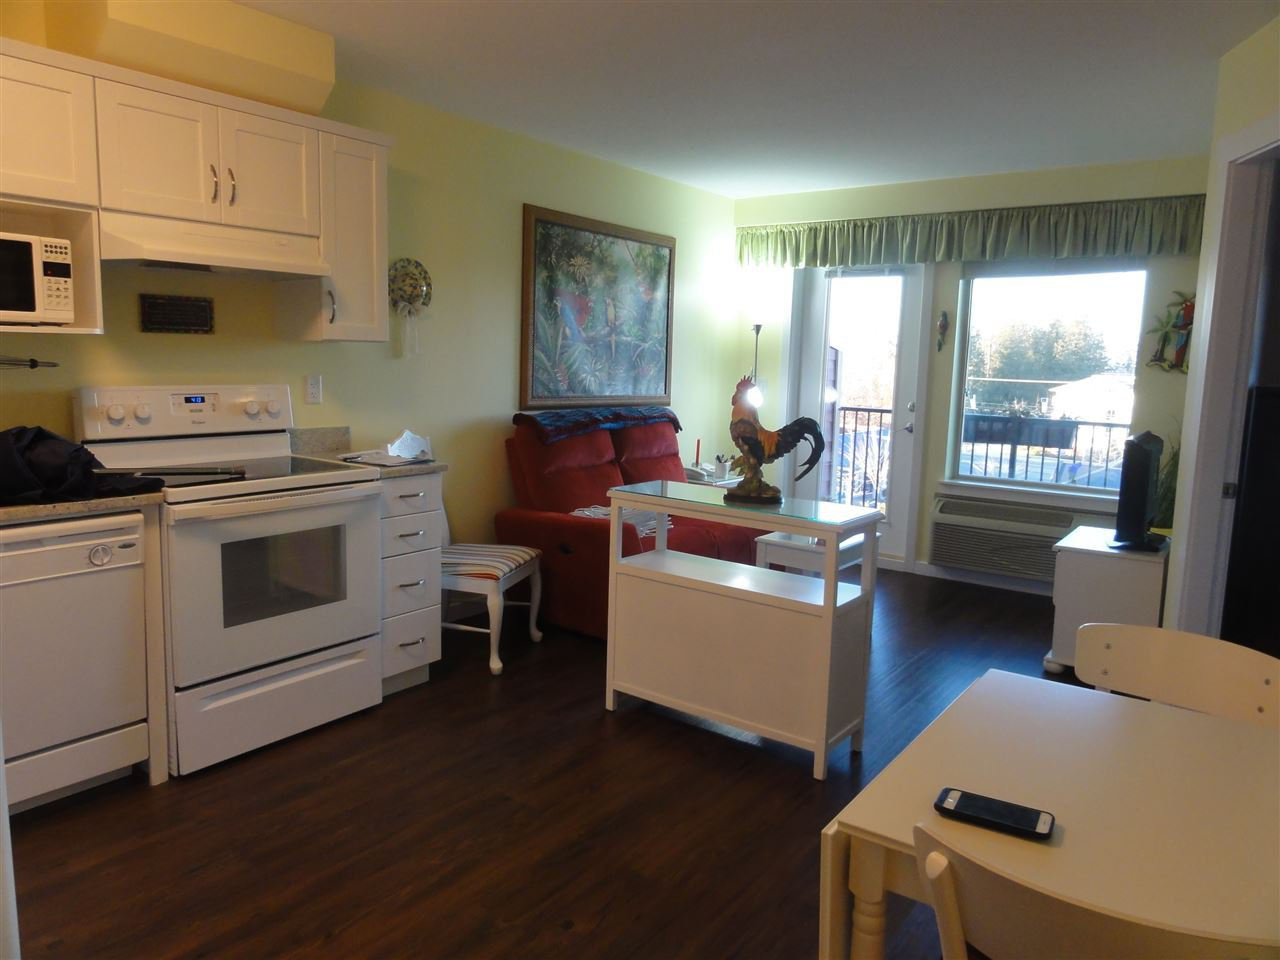 "Photo 8: Photos: 431 22323 48 Avenue in Langley: Murrayville Condo for sale in ""AVALON GARDENS"" : MLS®# R2134591"